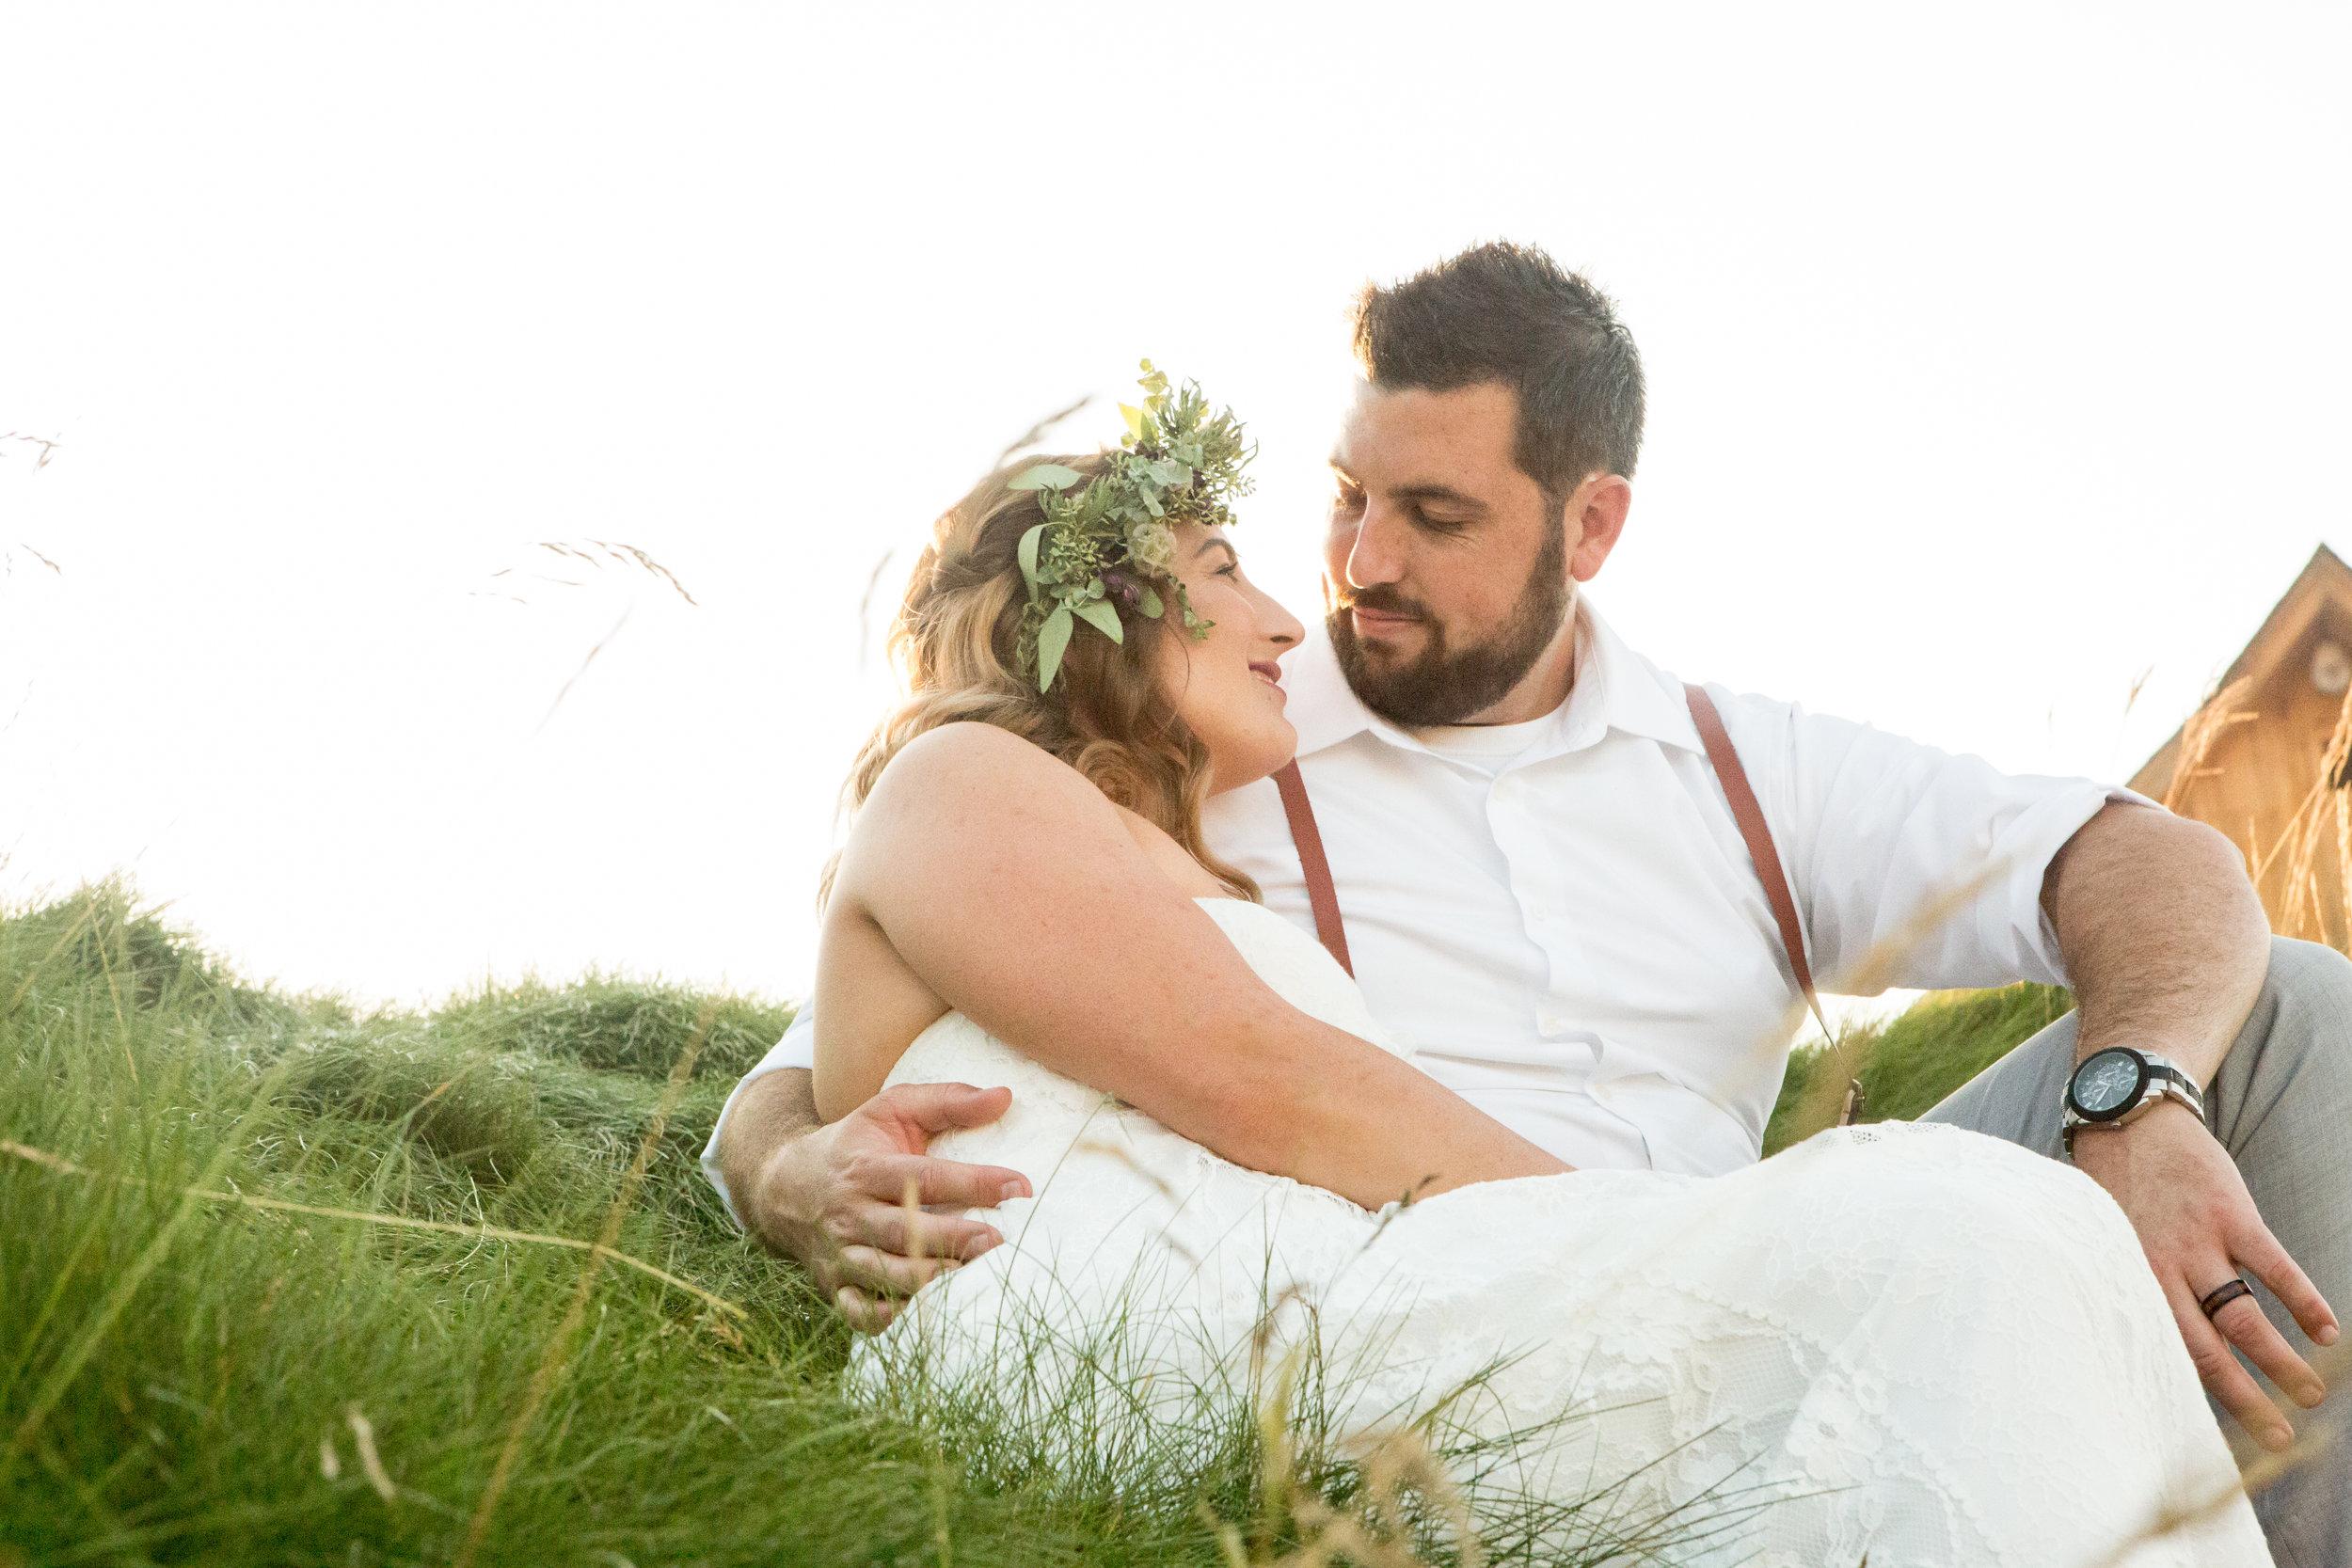 Keith & Aleecia's Wedding - San Luis Obispo CAAugust 4th, 2018